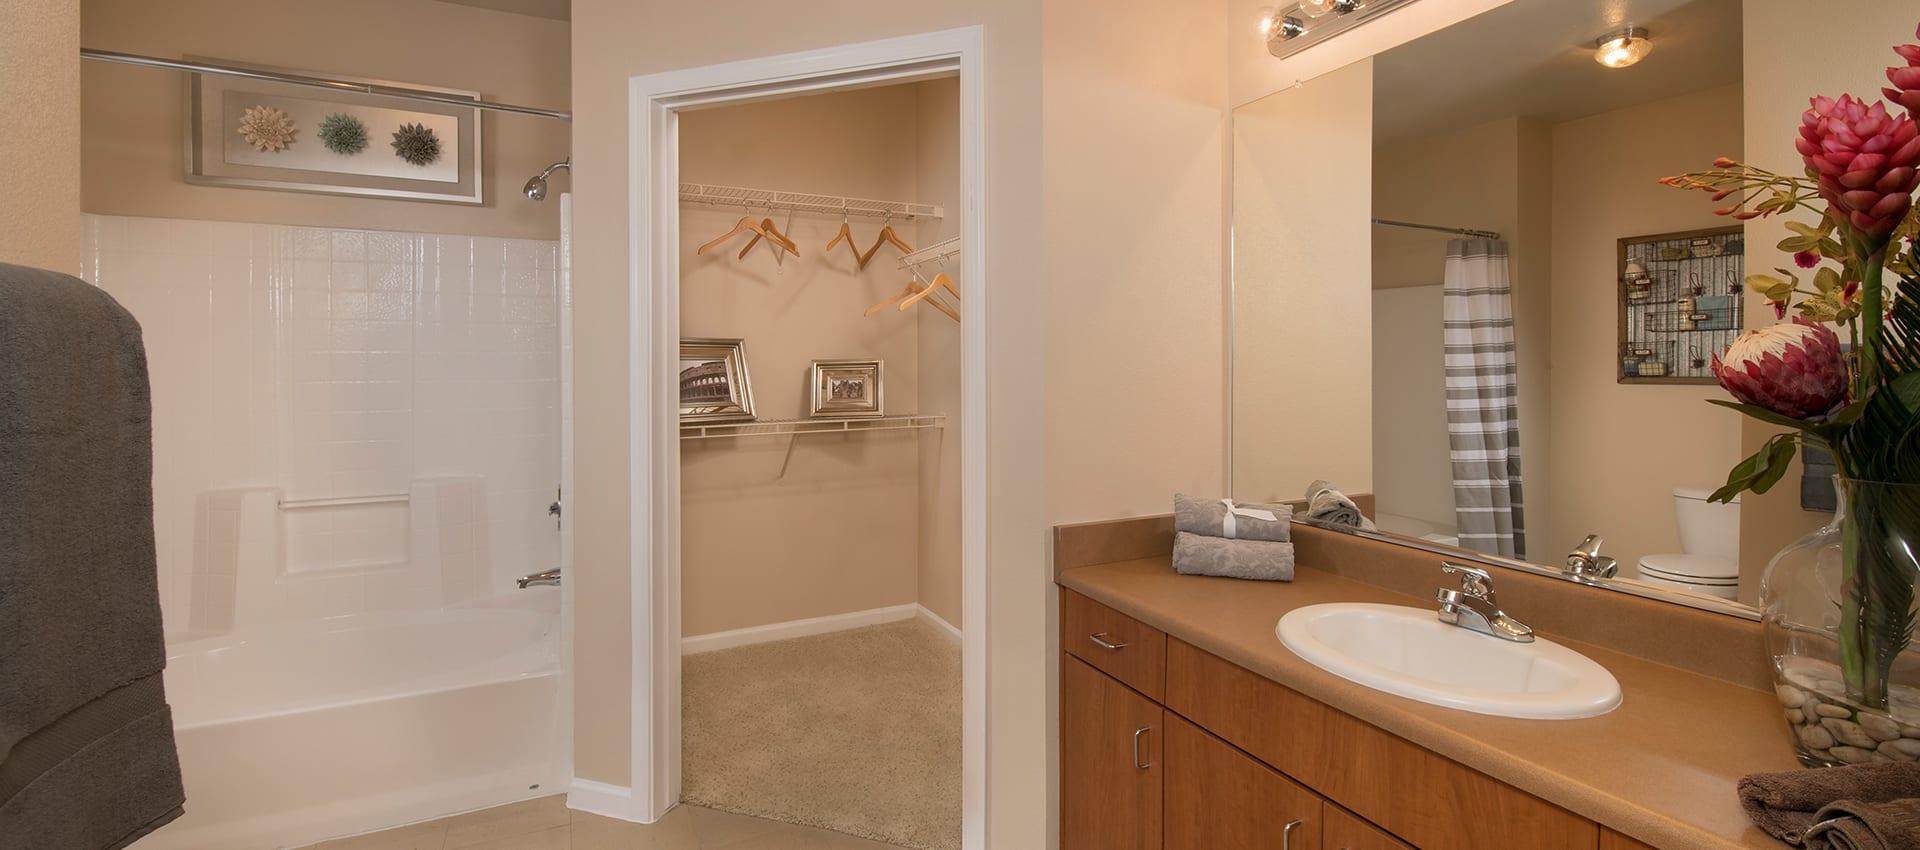 Bathroom and walk-in closet at Esplanade Apartment Homes in Riverside, California